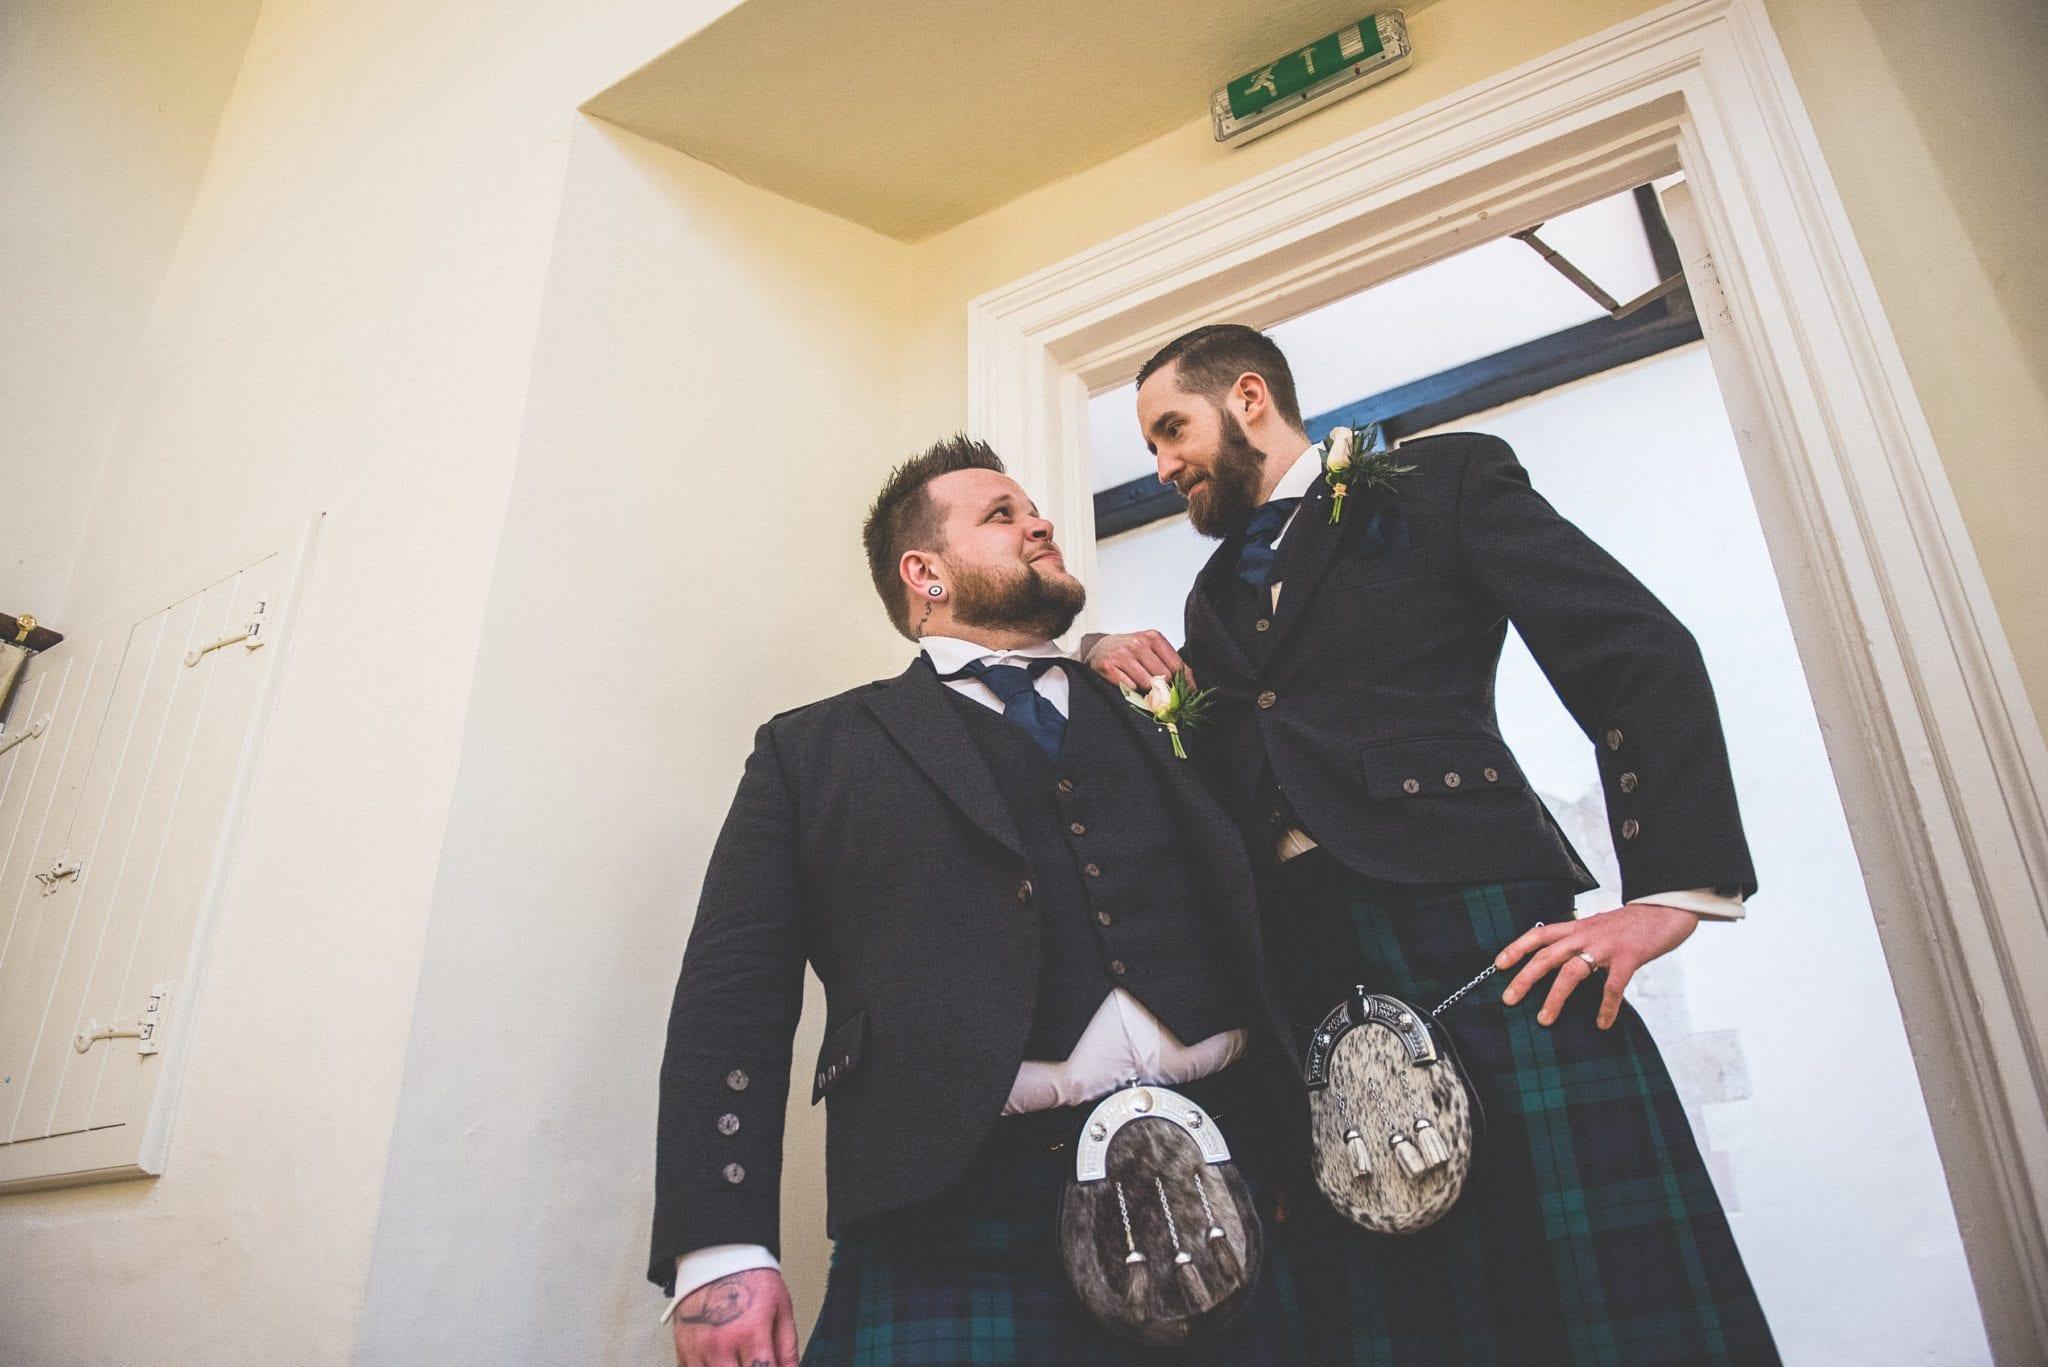 Documentary wedding photographer Maria Assia Photography wedding at Farnham Castle